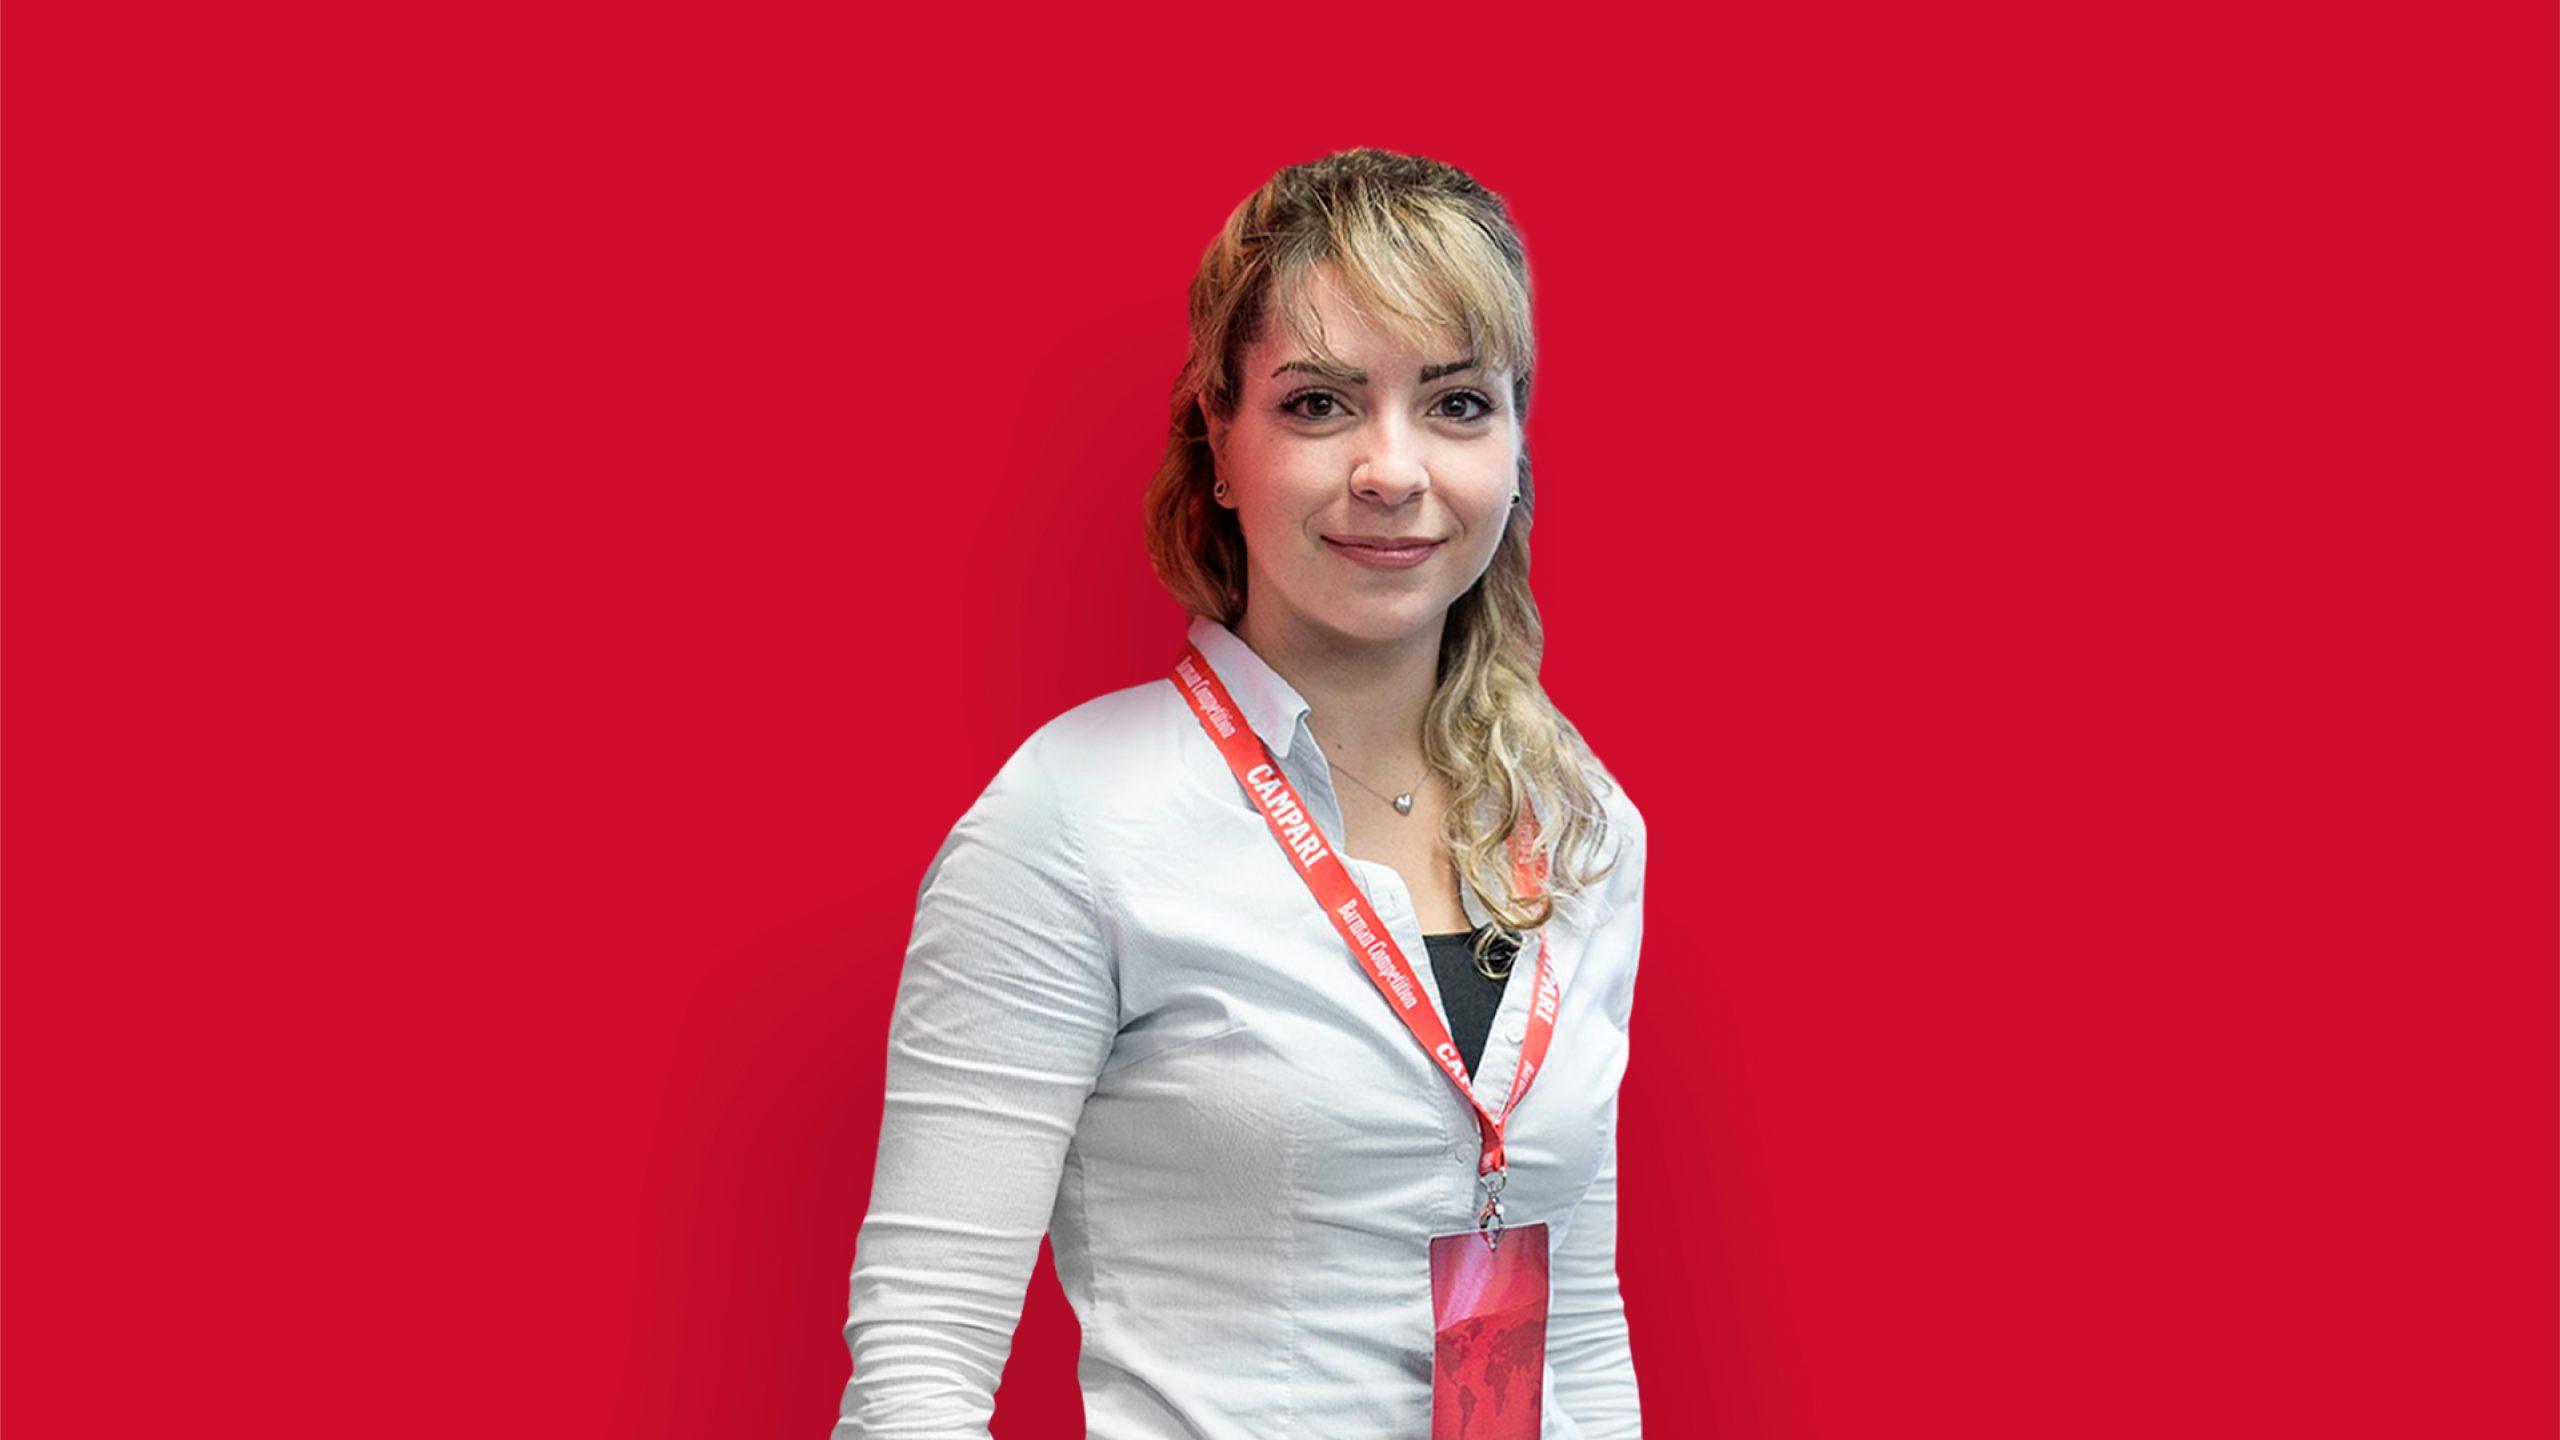 Luana Bosello